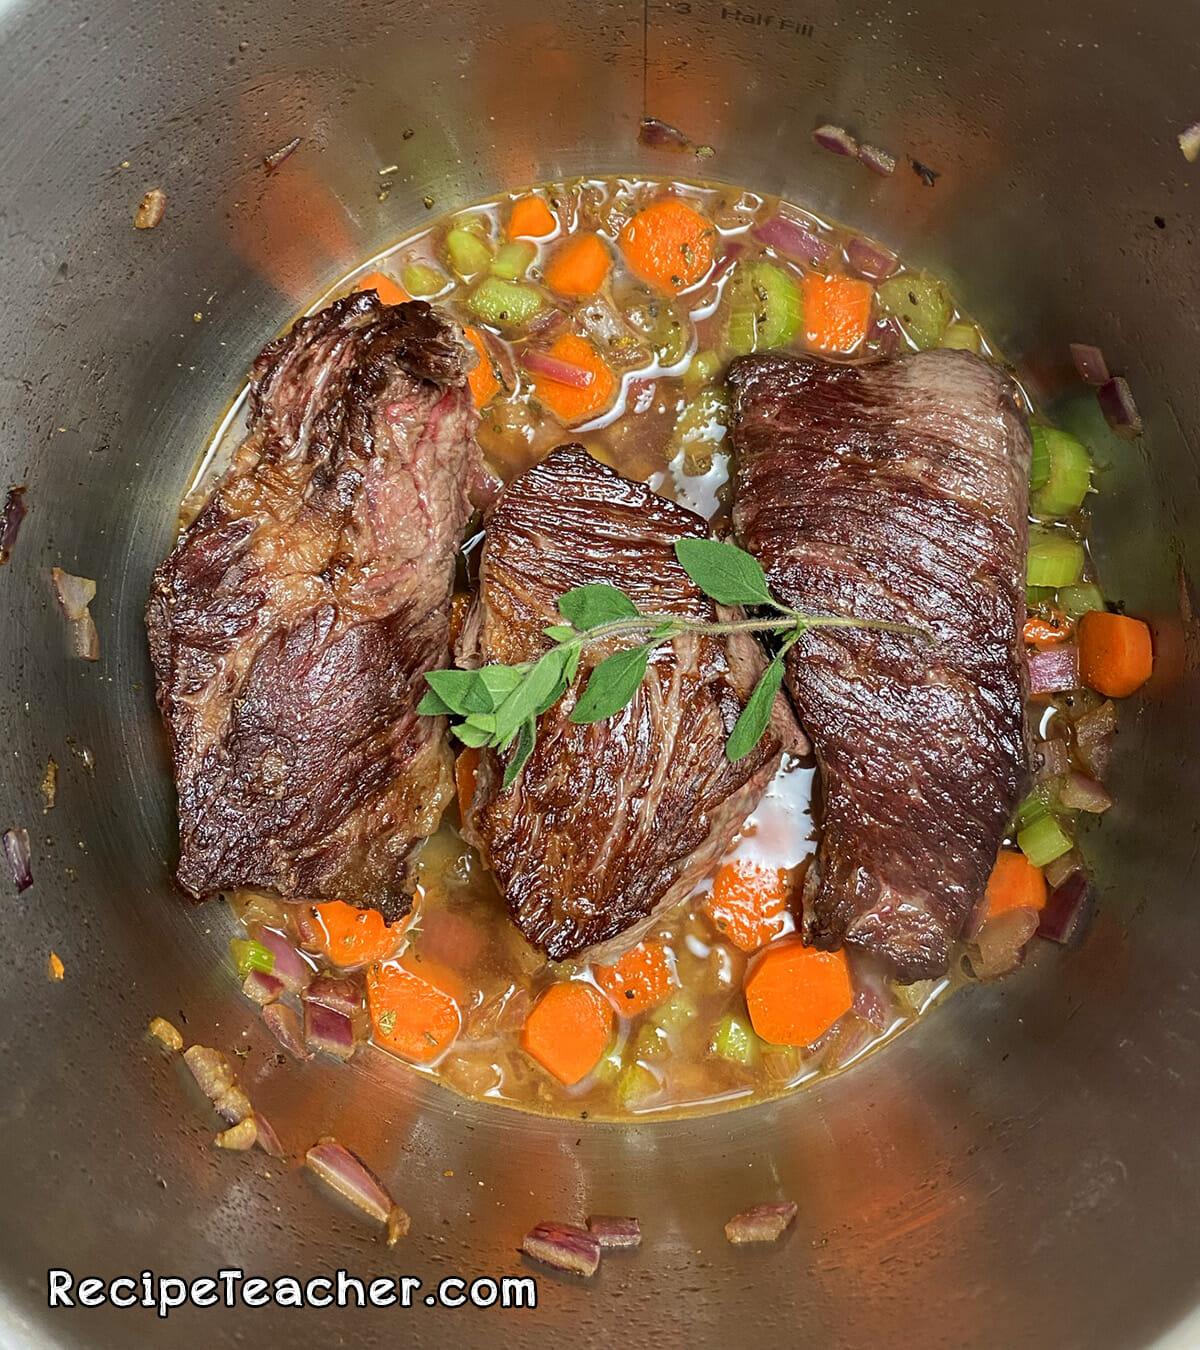 Recipe for Instant Pot beef short ribs